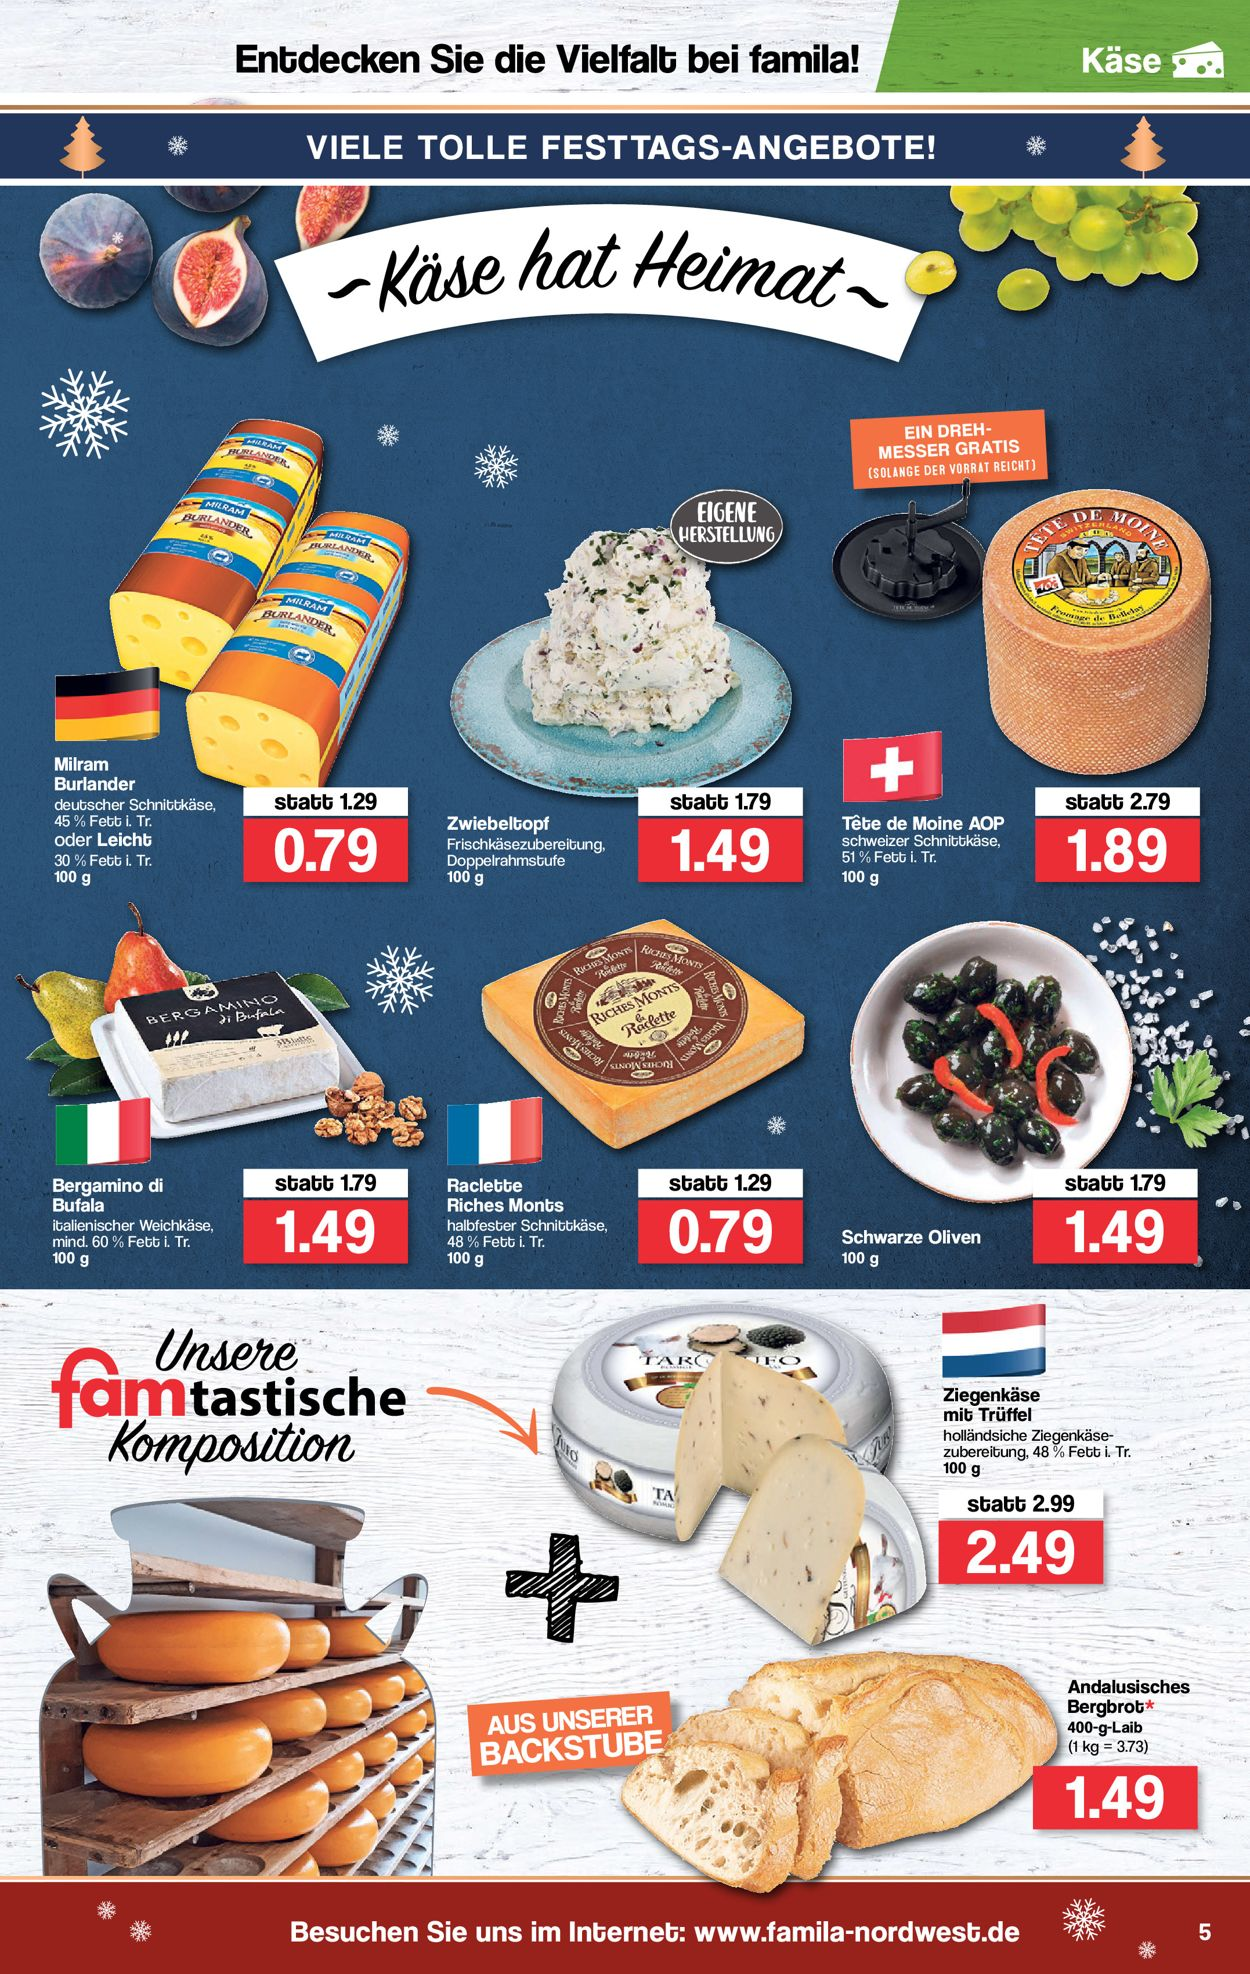 Famila Weihnachtsprospekt 2019 Aktueller Prospekt 23 12 31 12 2019 5 Jedewoche Rabatte De